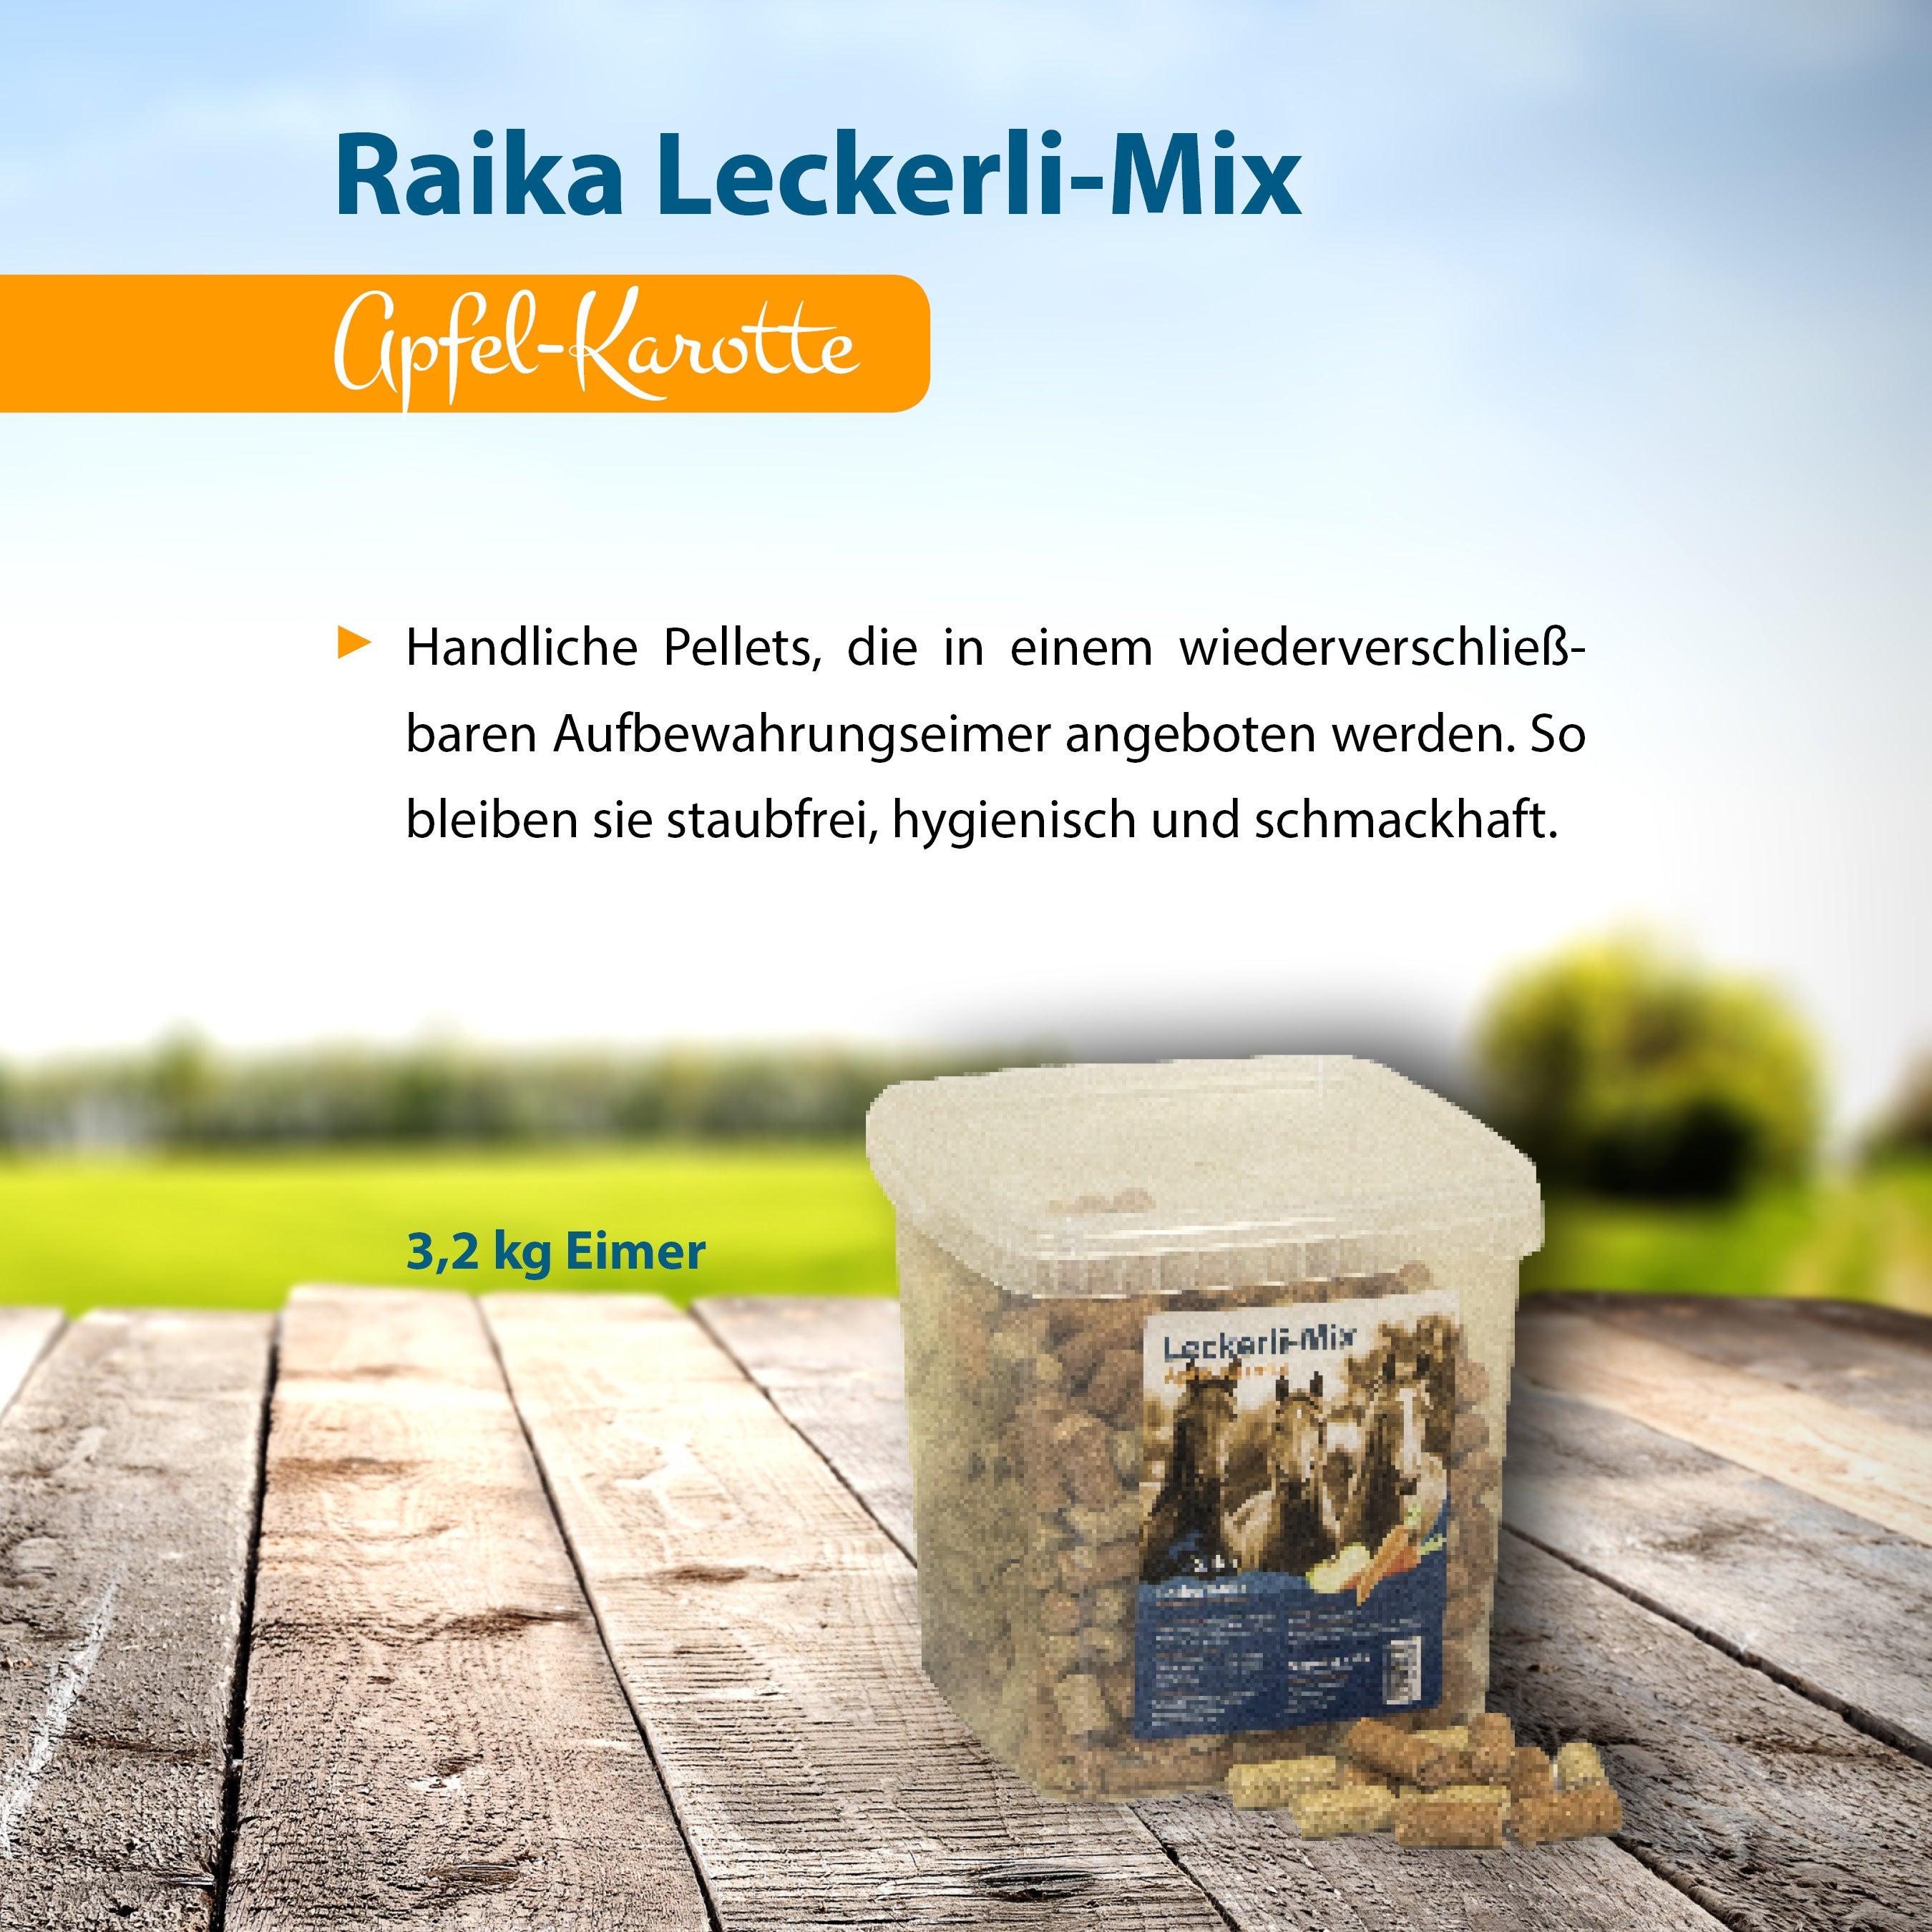 Raika Leckerli-Mix Apfel-Karotte Pferdefutter